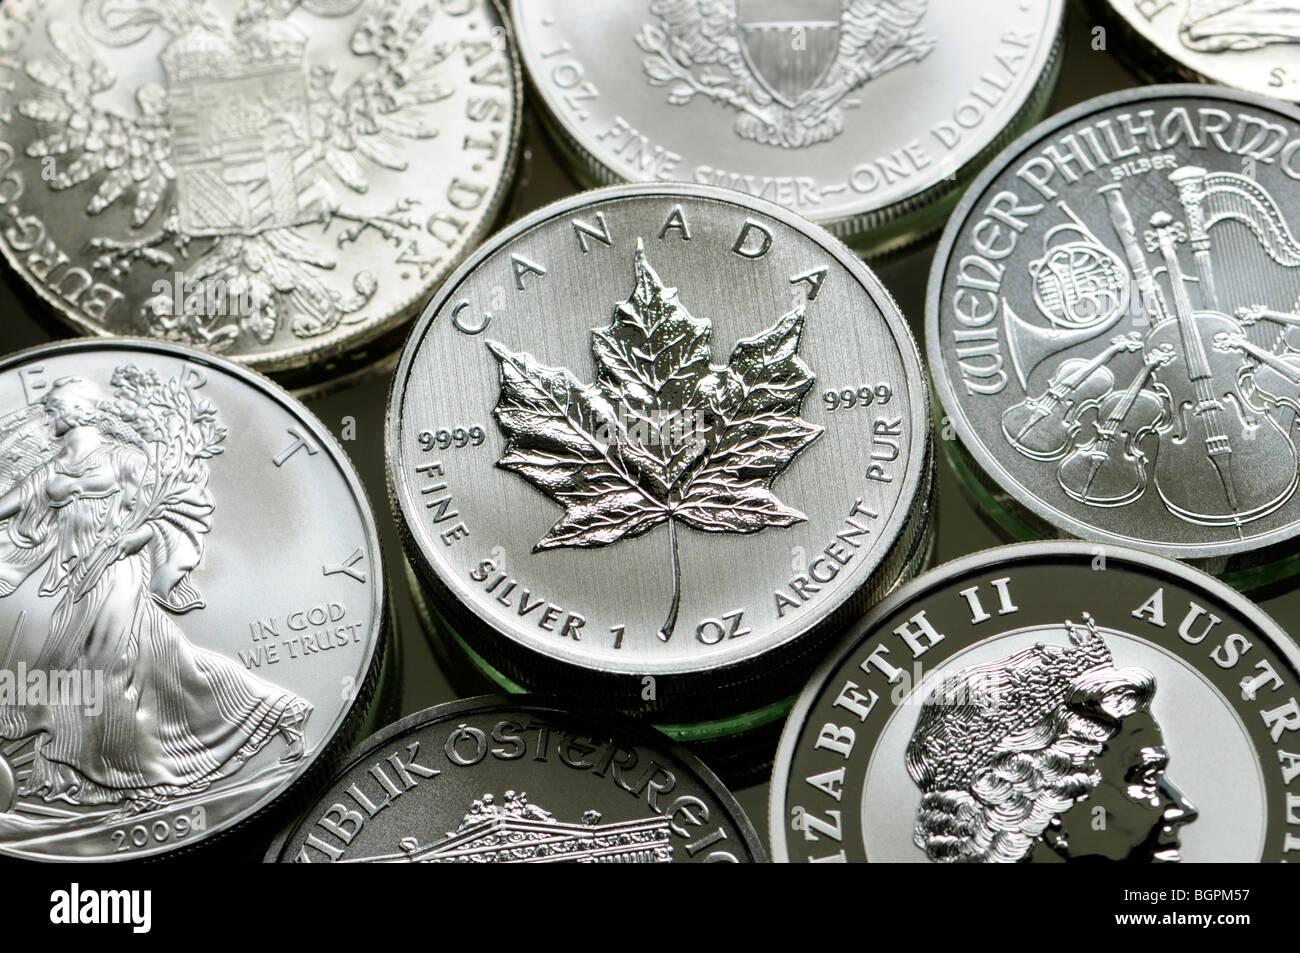 Pure Silver Bullion Coins from USA, Canada, Austria and Australia - Stock Image